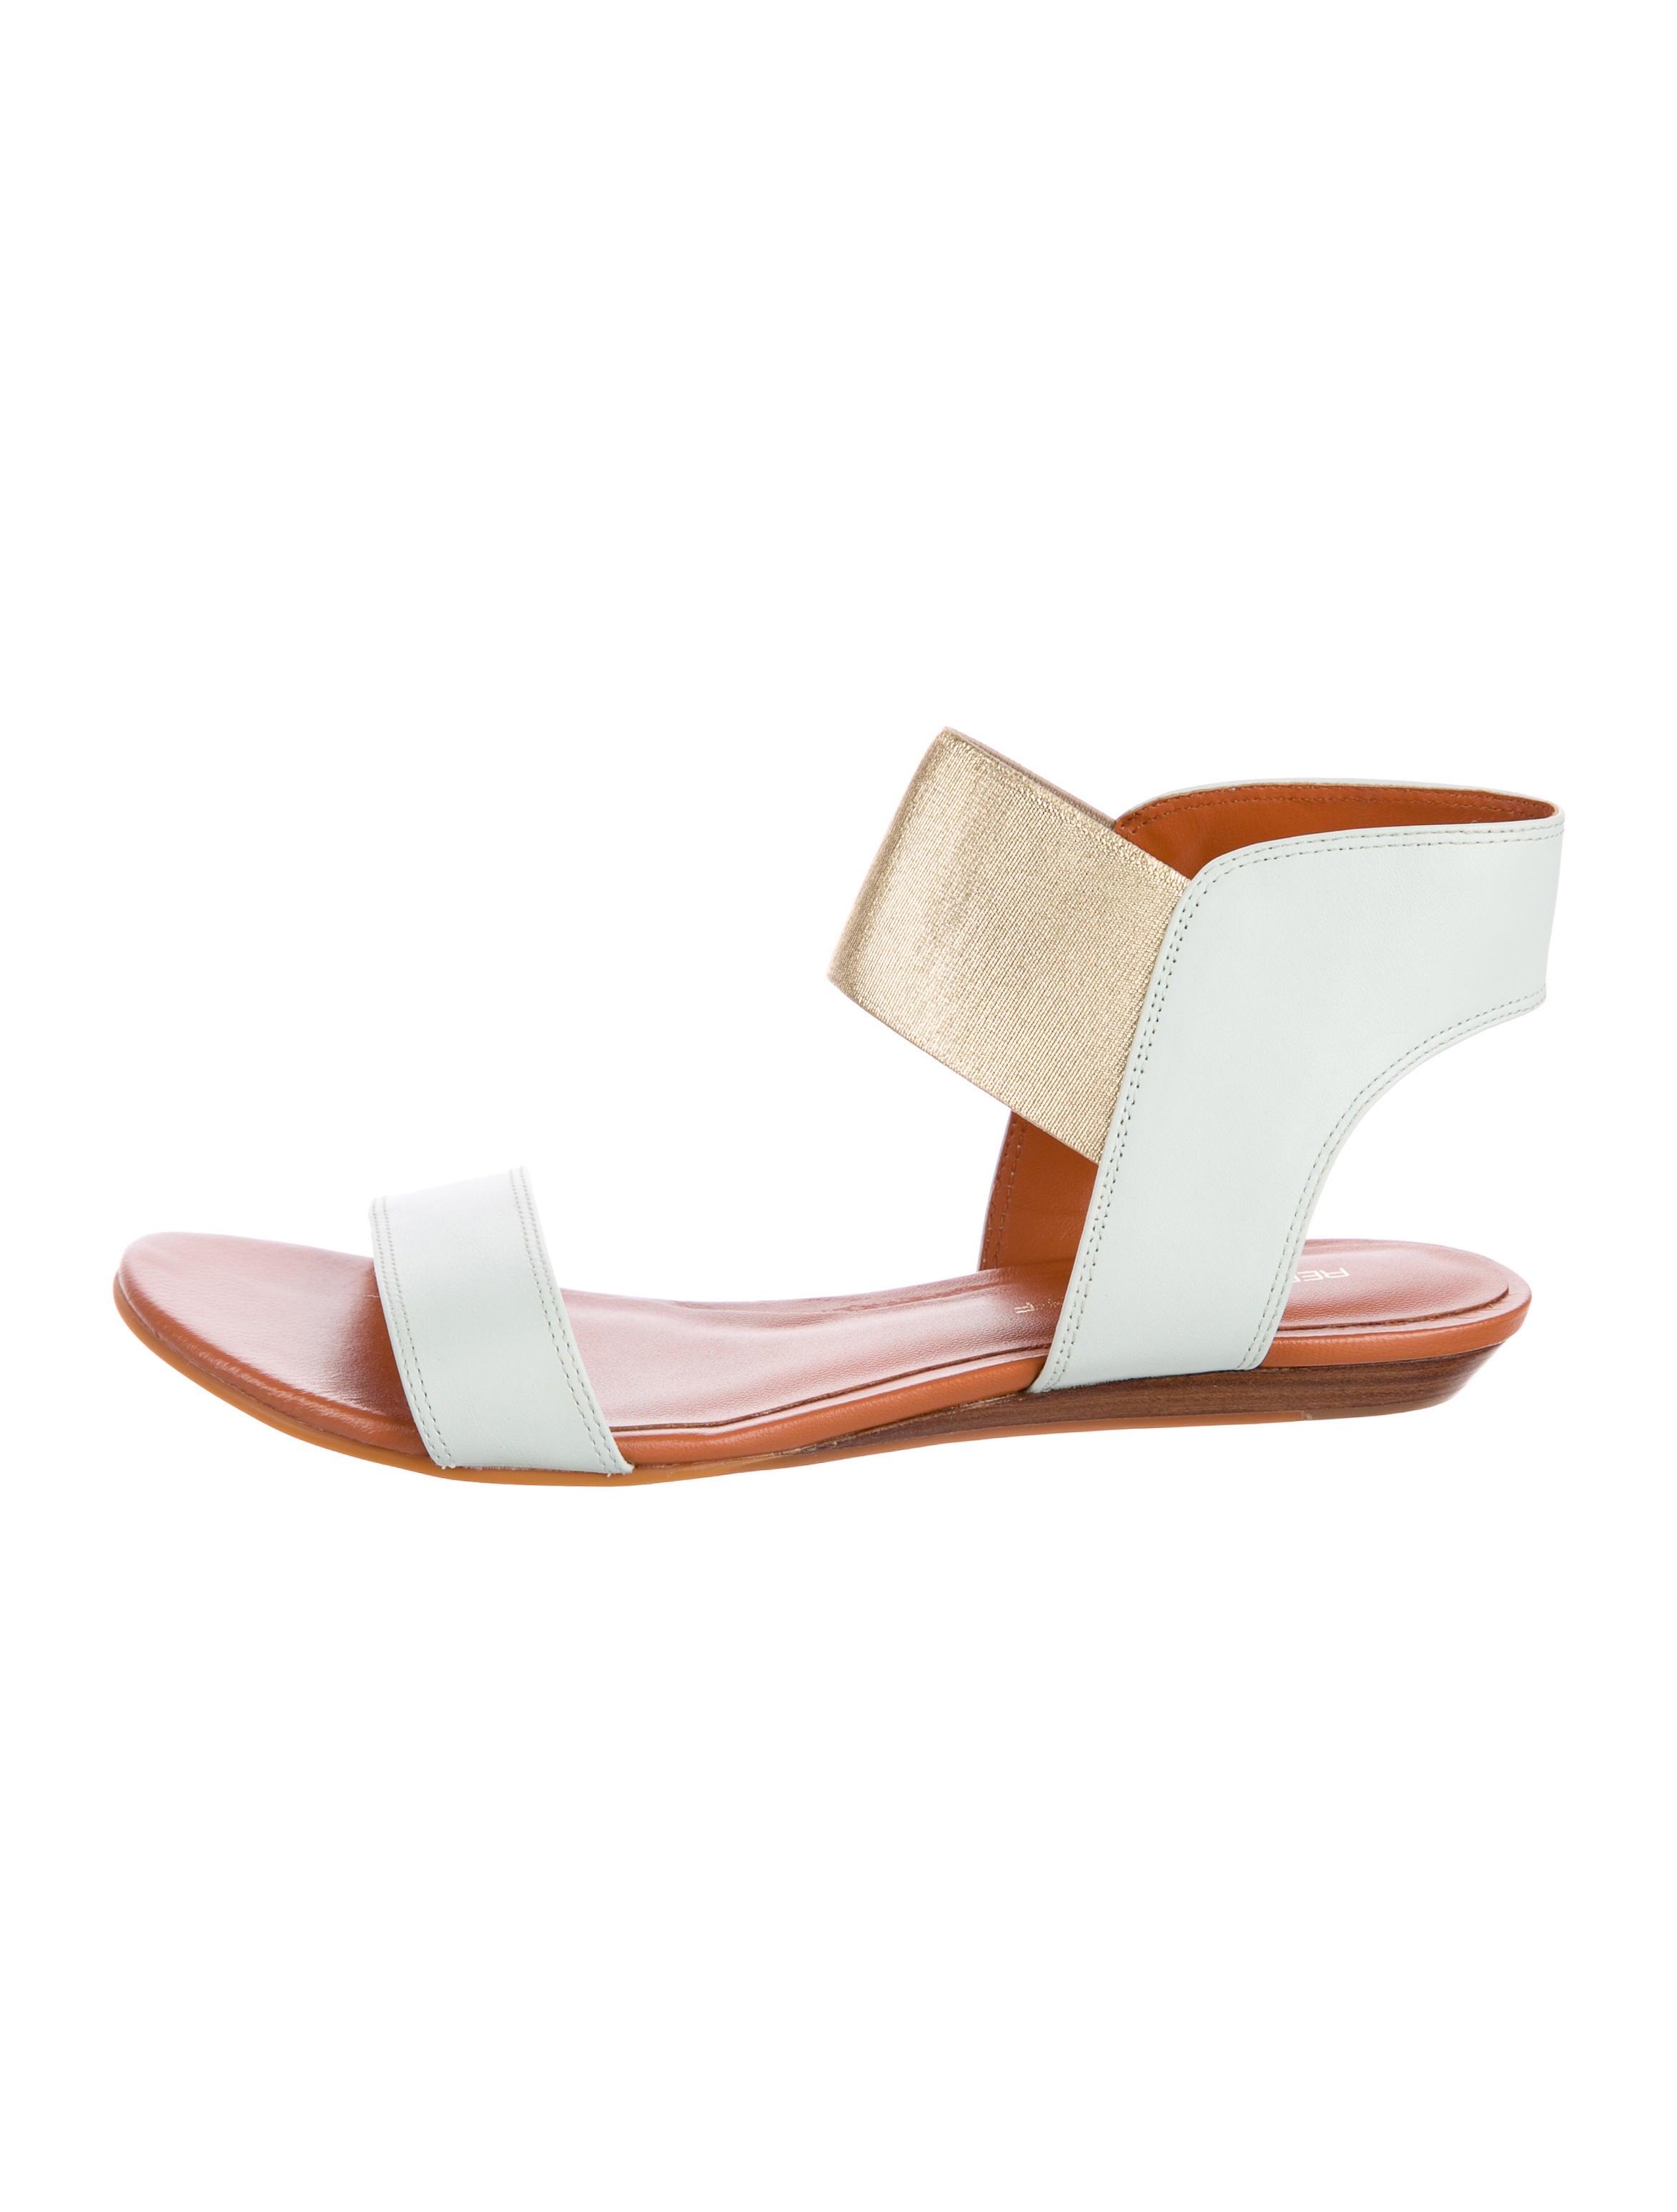 buy cheap low shipping Rebecca Minkoff Bazzle Metallic Sandals online Shop ddXsZrU